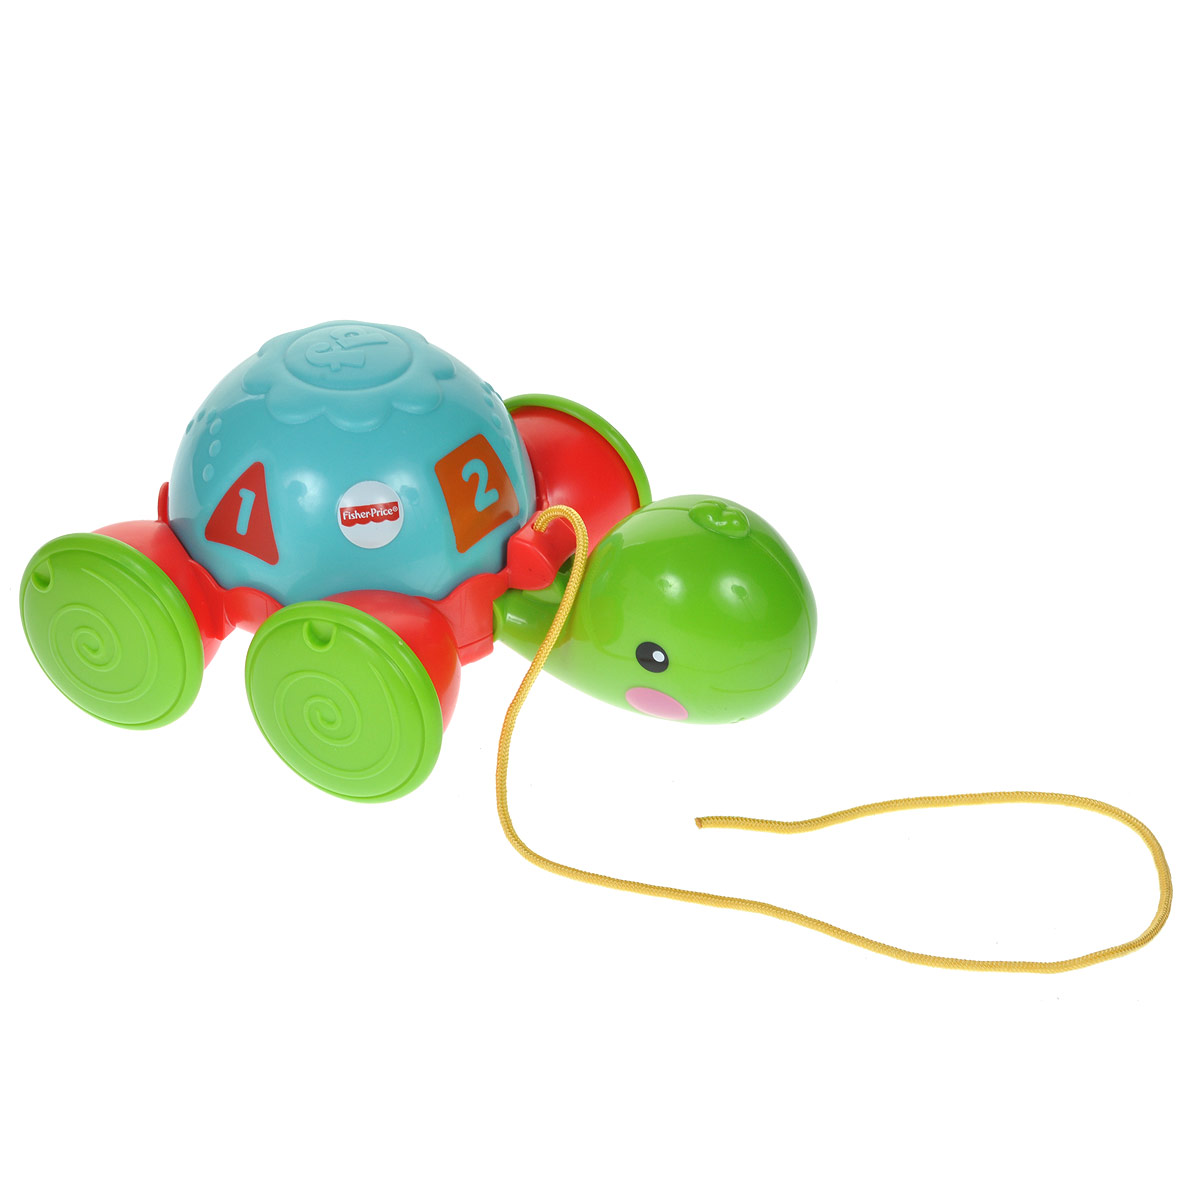 Fisher-Price Infant Каталка Обучающая черепашка на колесиках